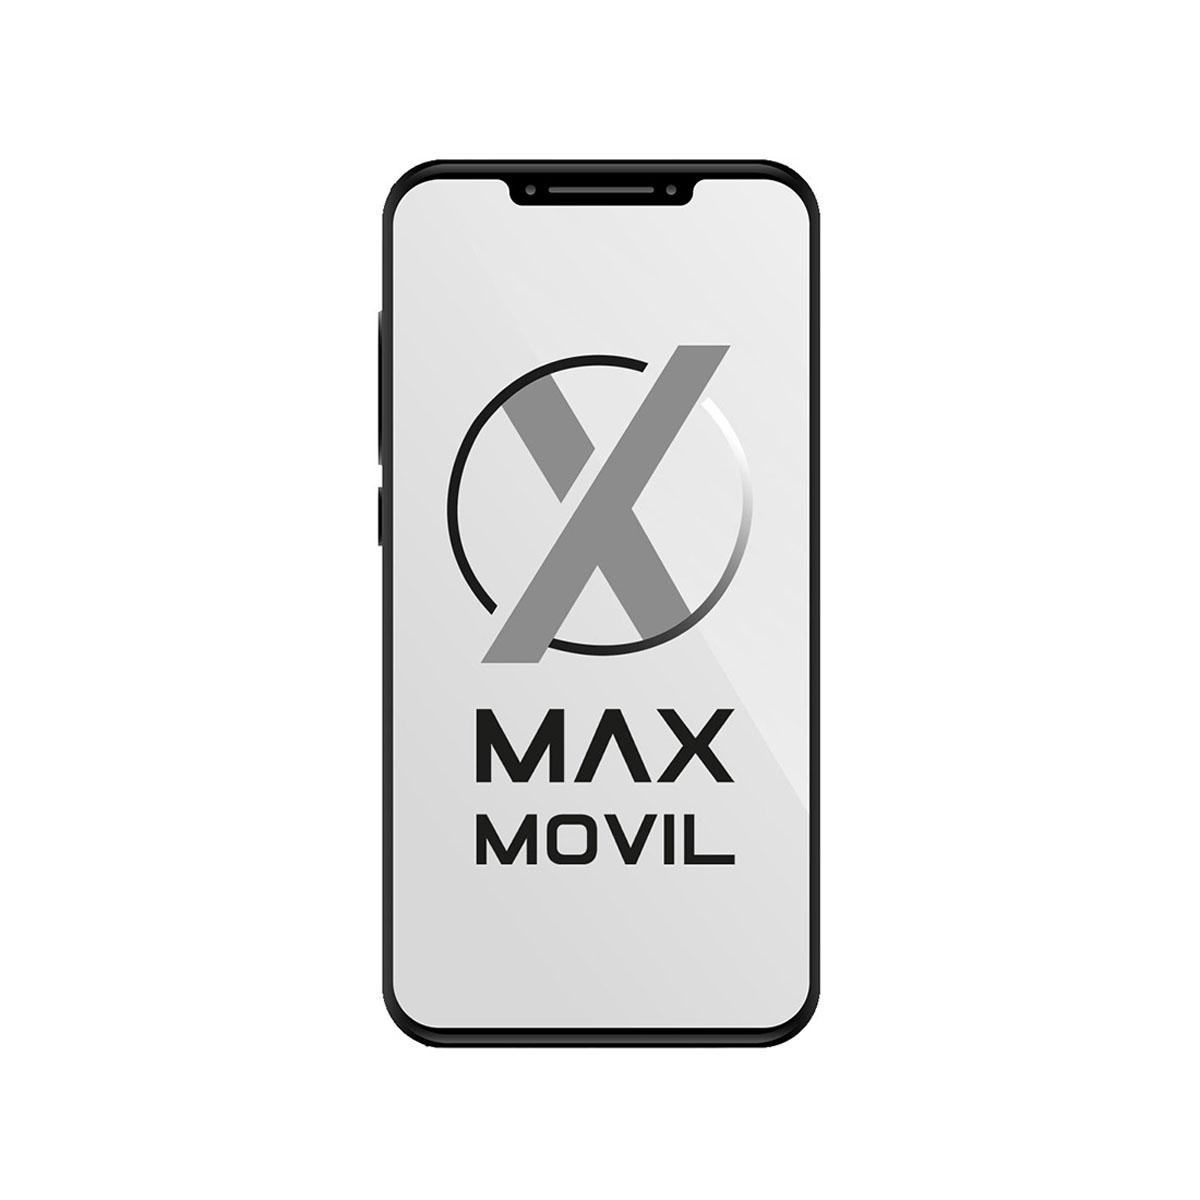 Tarjeta Memory Stick Micro M2 de 4GB con adaptador